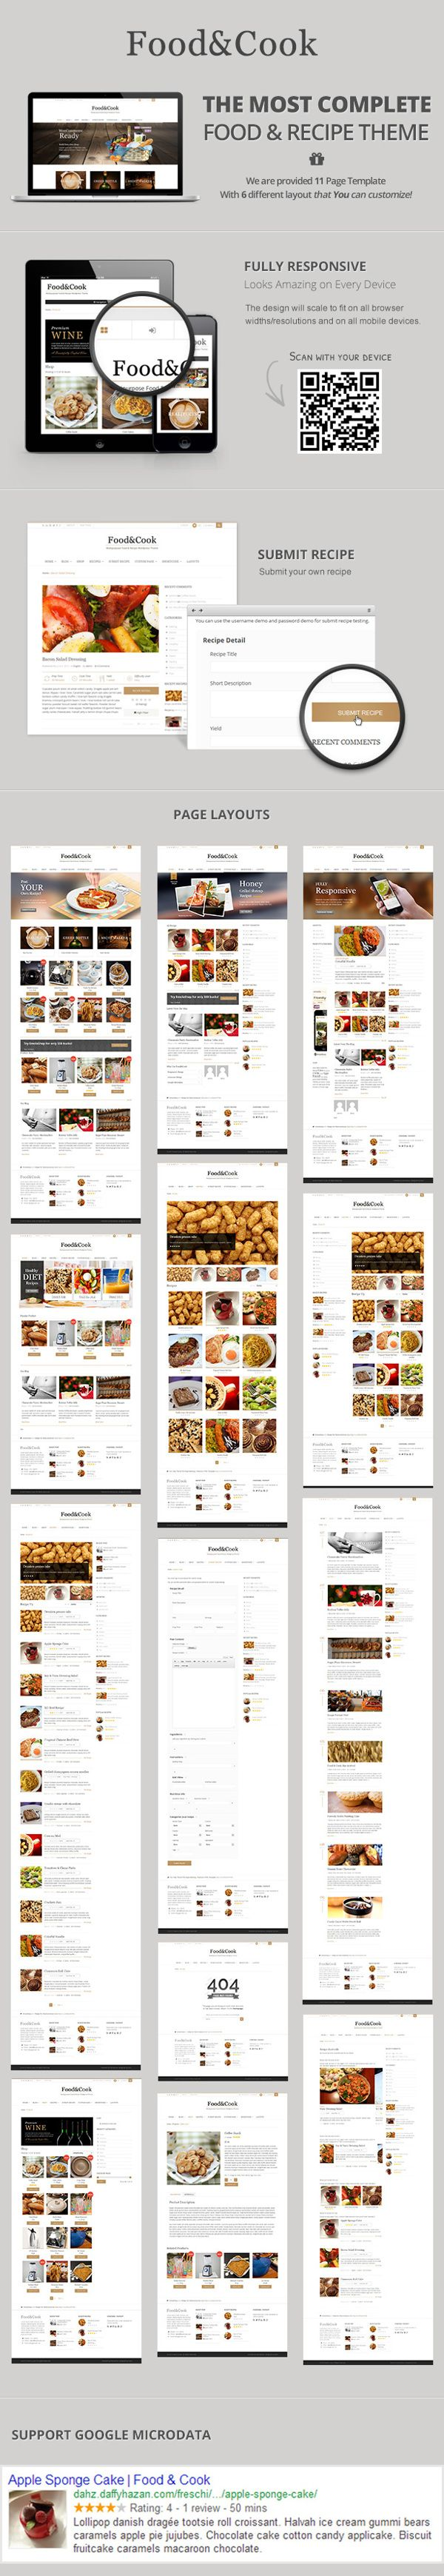 Food & Cook - Multipurpose Food Recipe WP Theme by ibrahim ekinci, via Behance